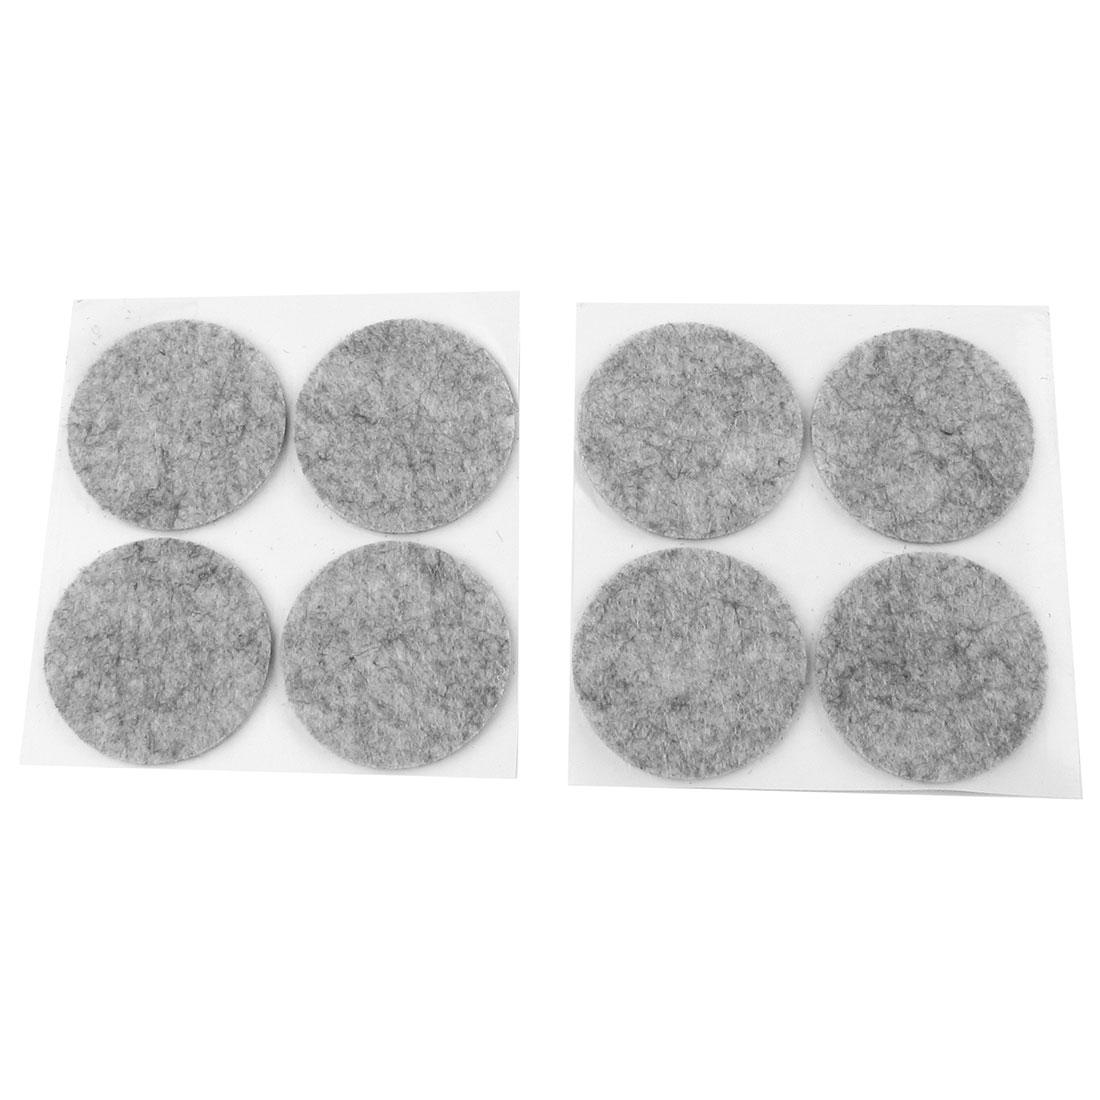 "8pcs Gray Adhesive Desk Table Leg PC Bottom Round 1.6"" Mat Pad"